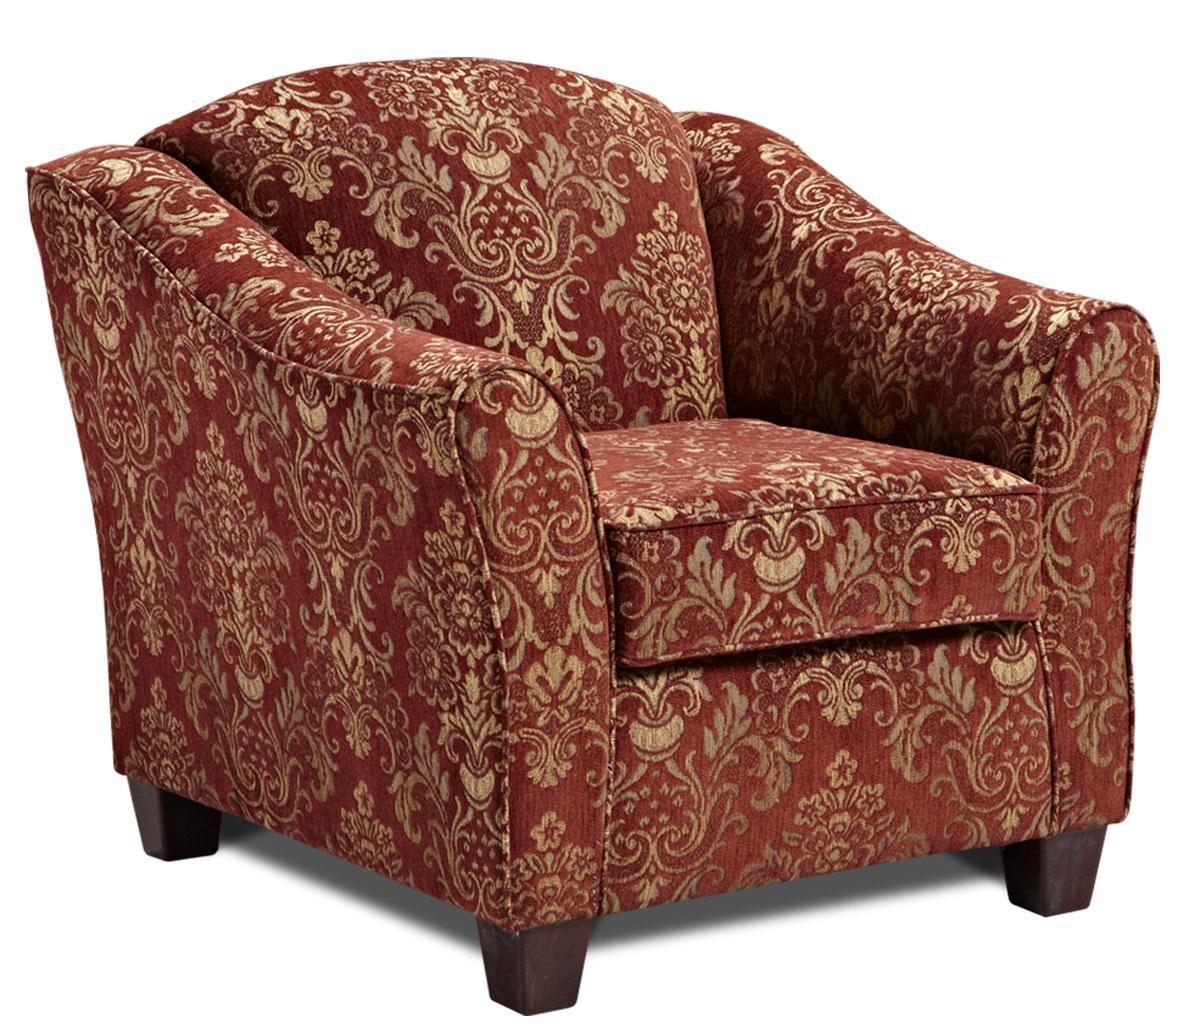 9900 Accent Chair by Washington Furniture at Lynn's Furniture & Mattress